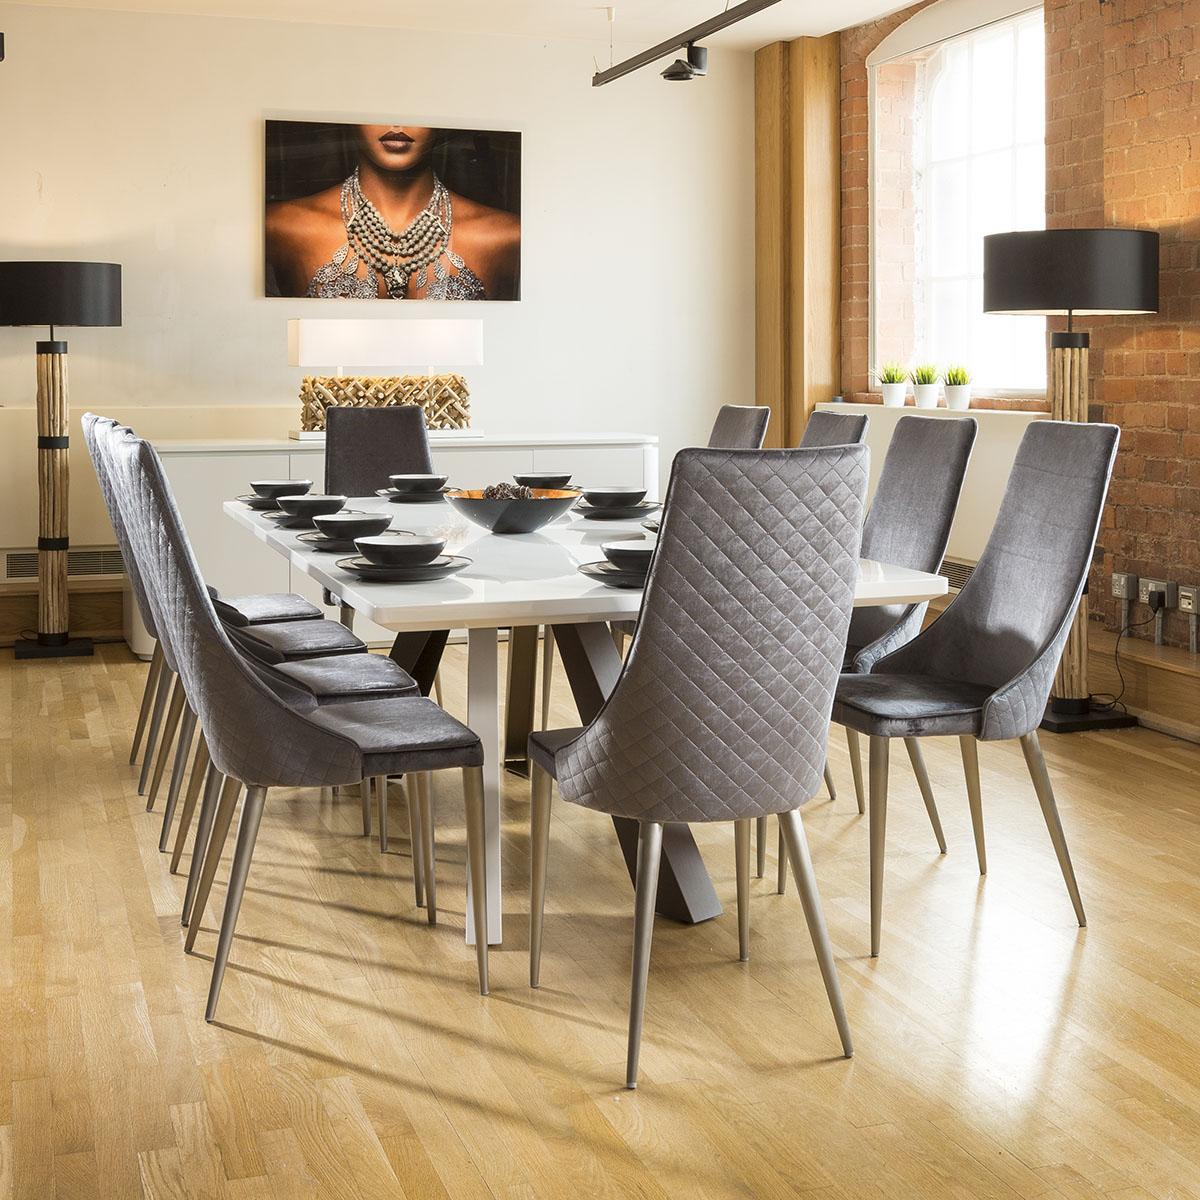 modern grey dining chairs uk high chair that folds flat set of 2 sleek velvet back